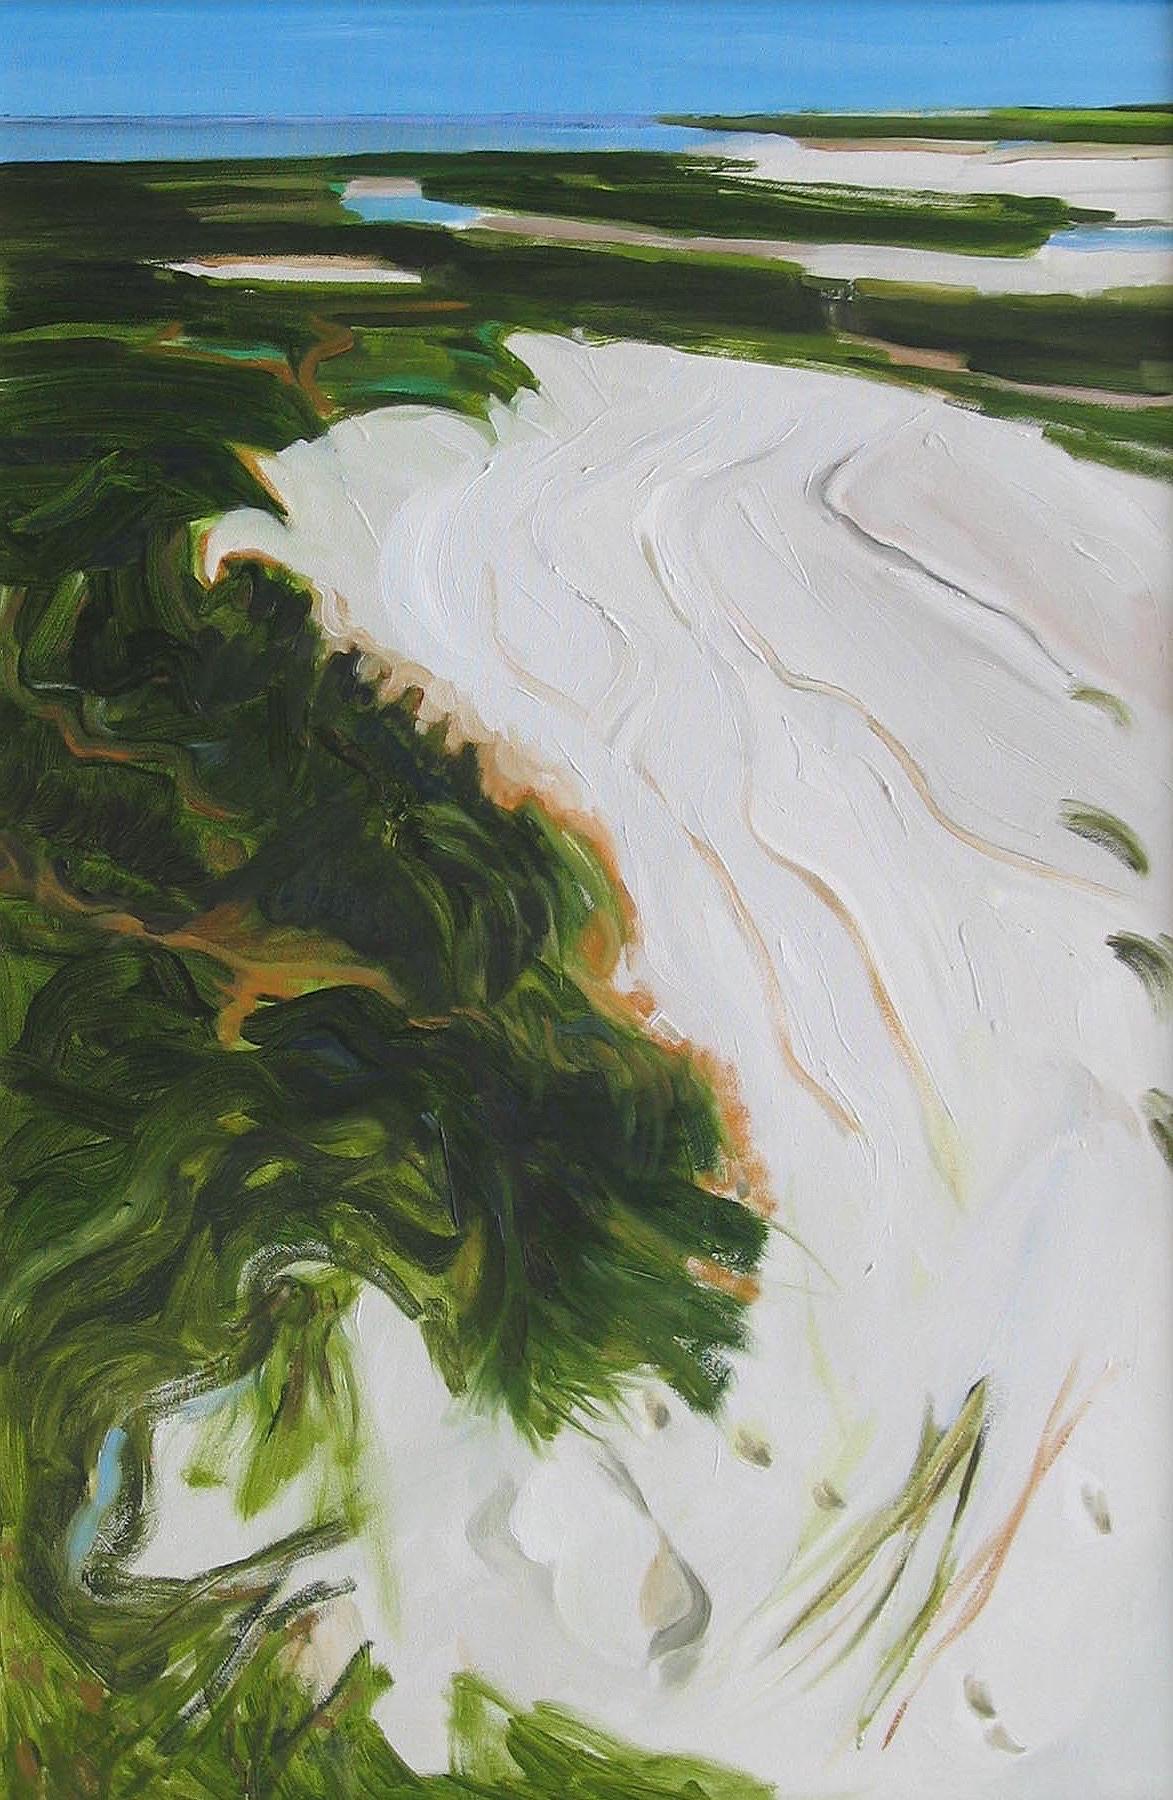 Marshlandforms2 (vertical).jpg